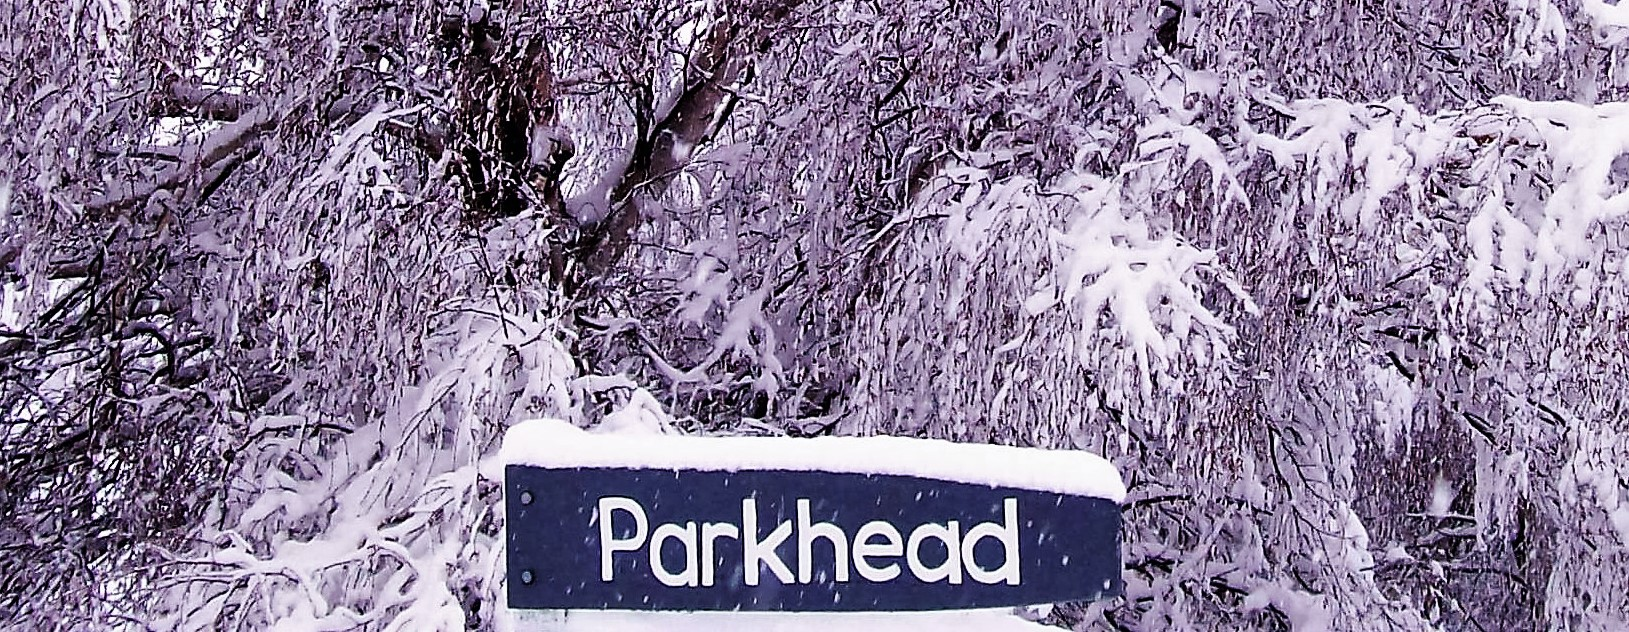 Parkhead sign